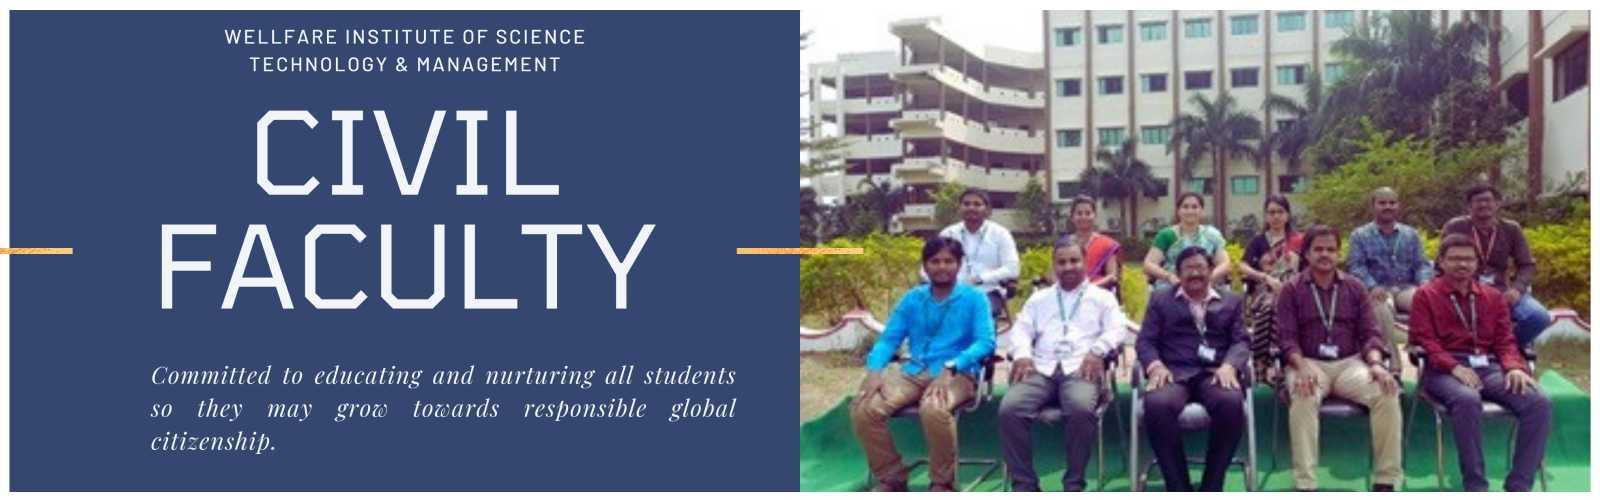 Civil faculty